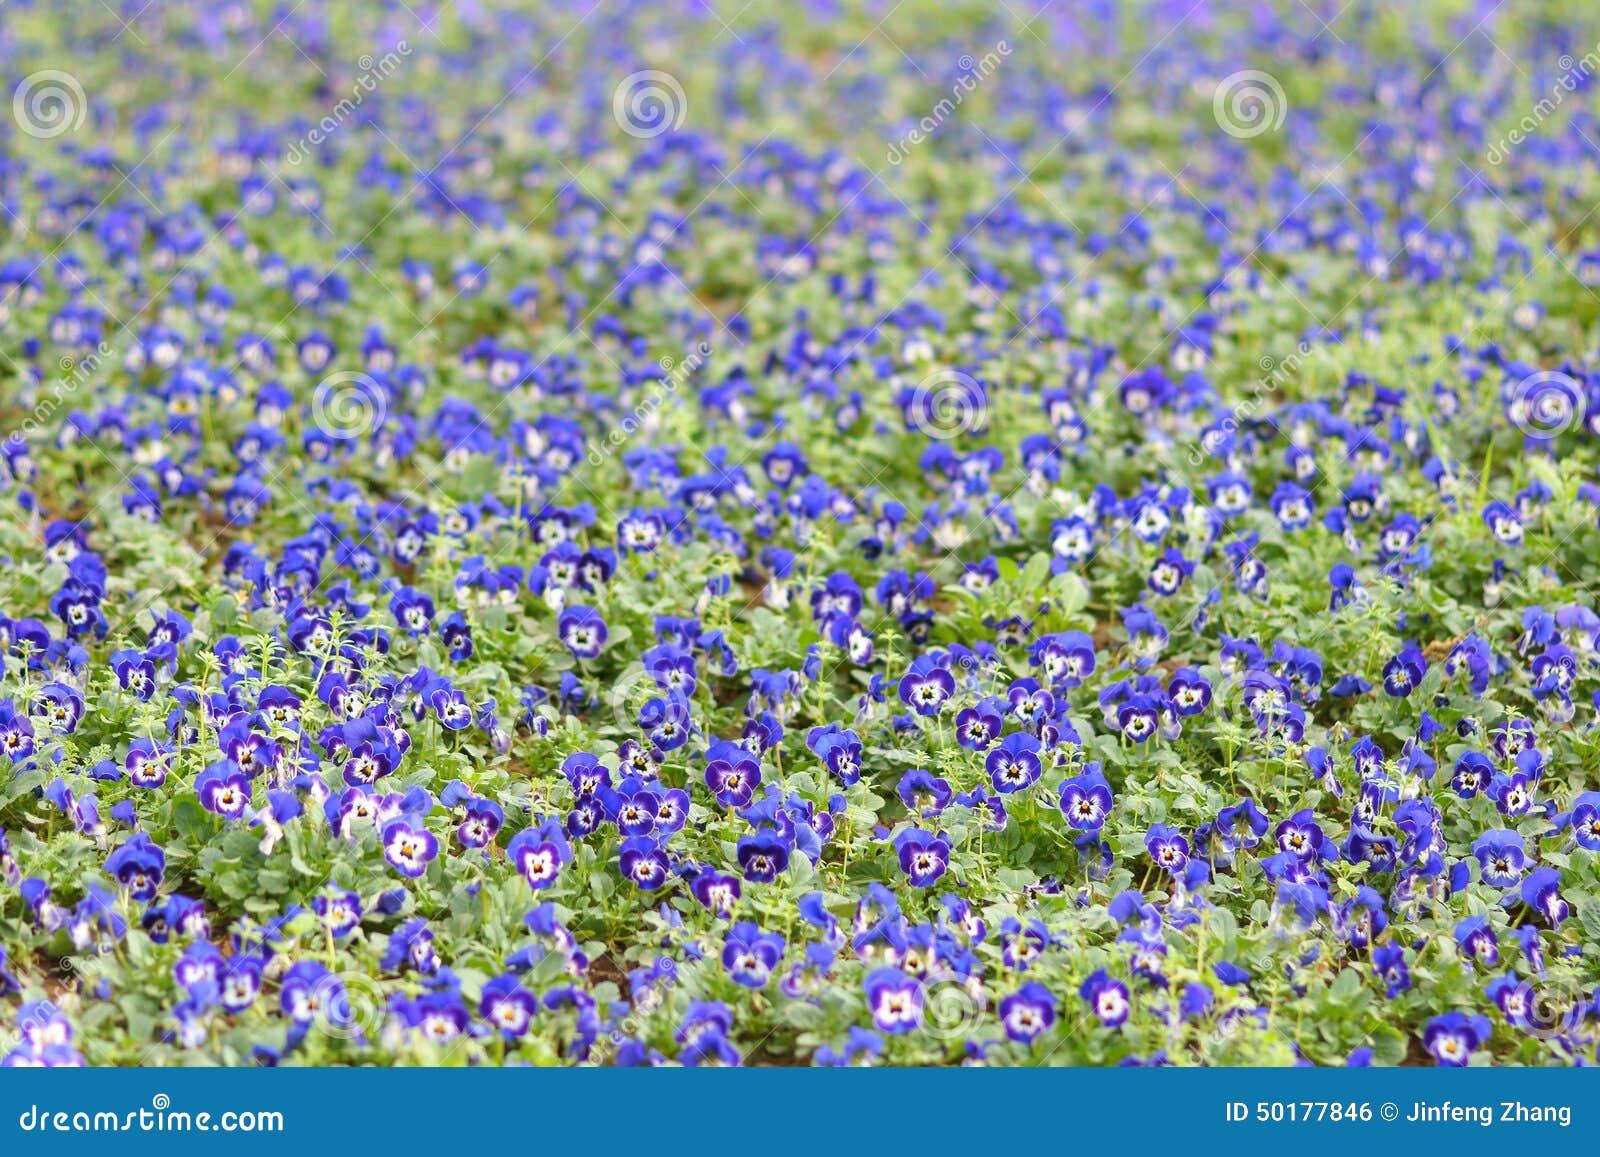 Herb trinity stock photo image of blue flowers small 50177846 image of blue flowers small 50177846 izmirmasajfo